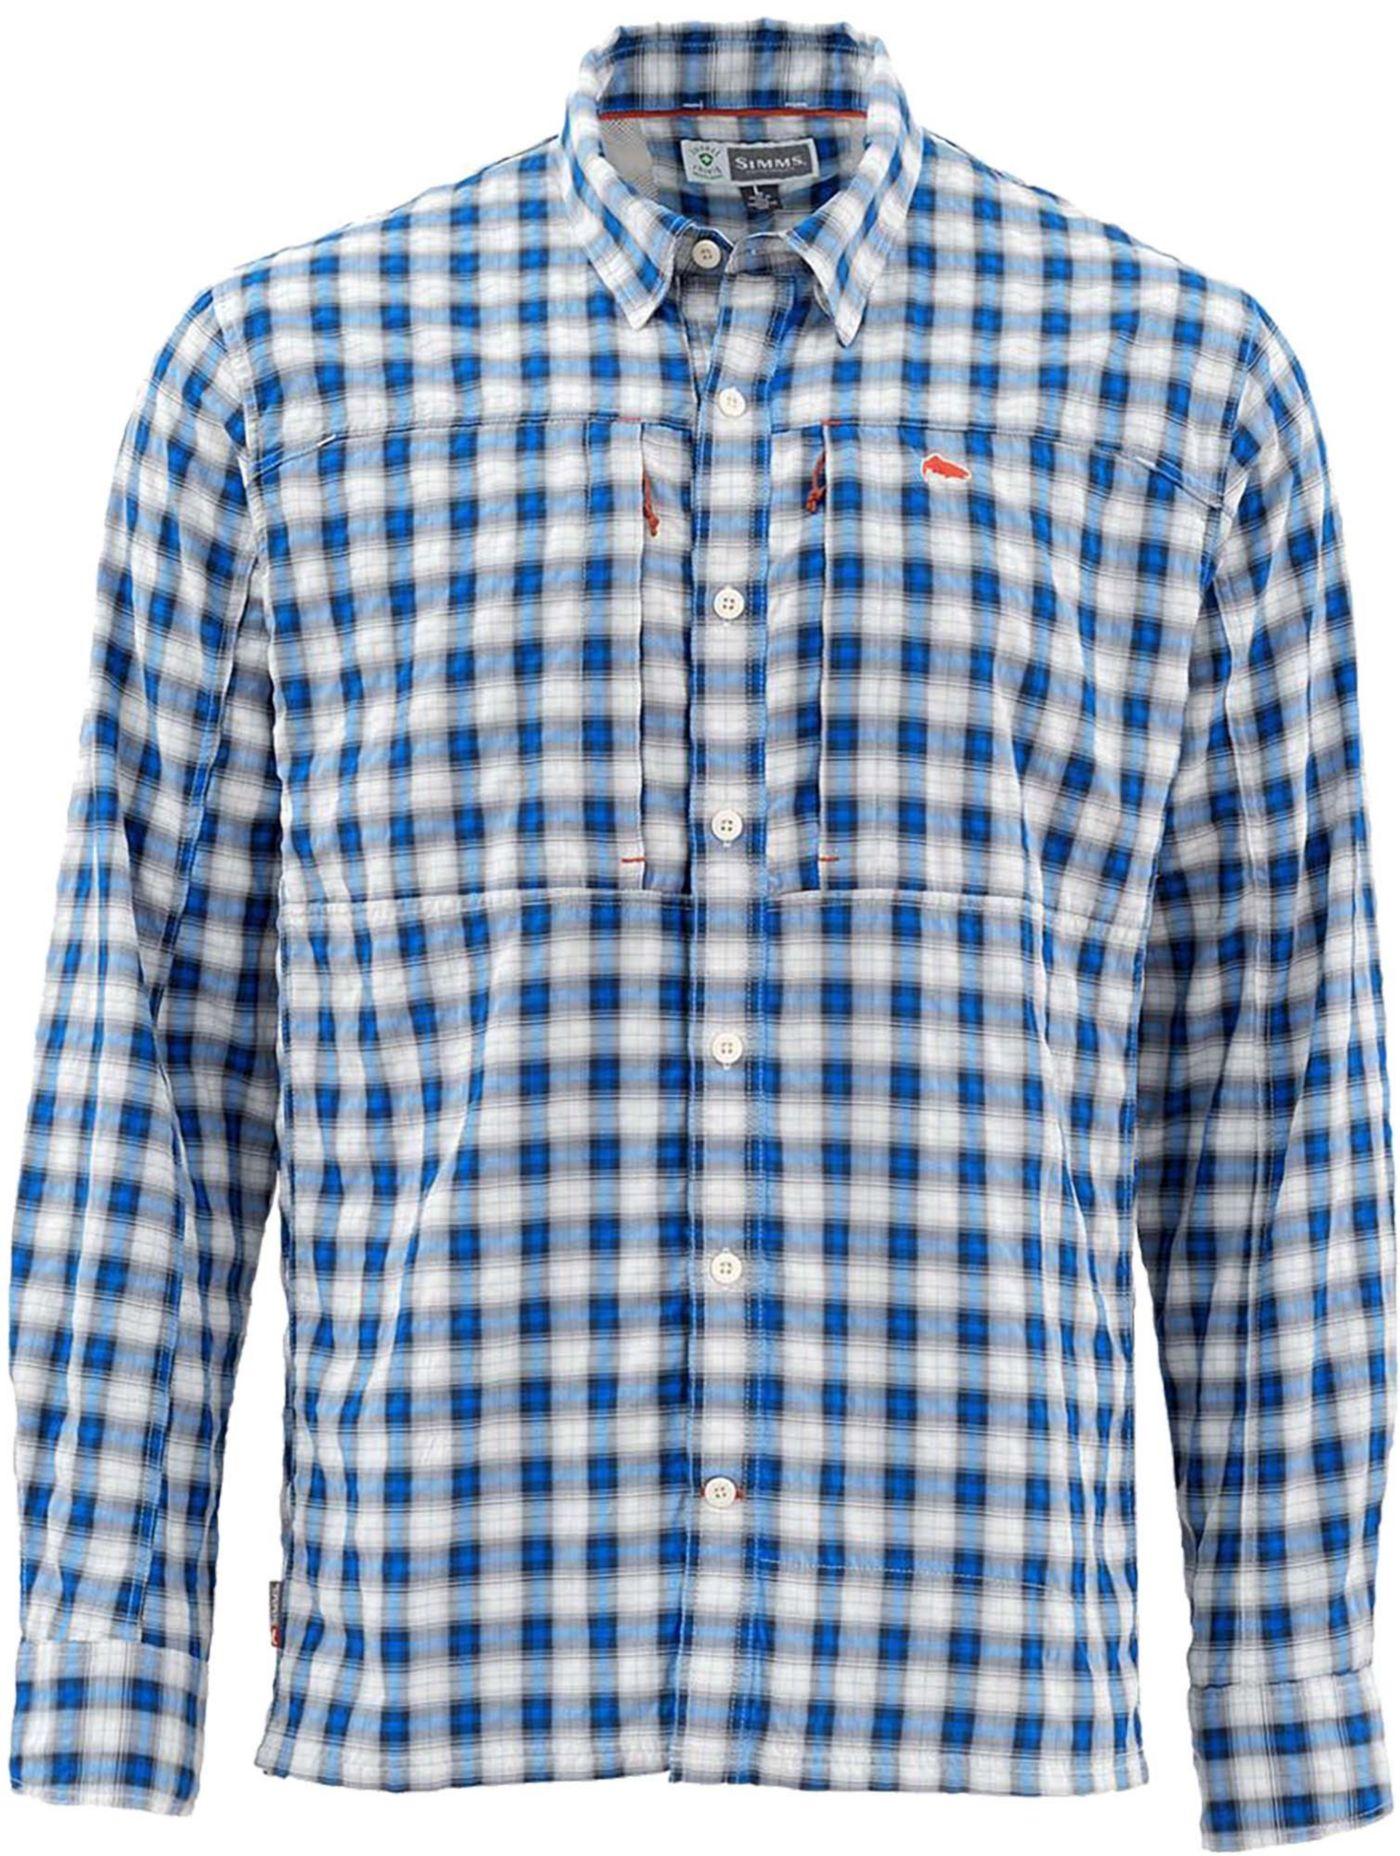 Simms Men's Bugstopper Plaid Long Sleeve Button Down Shirt